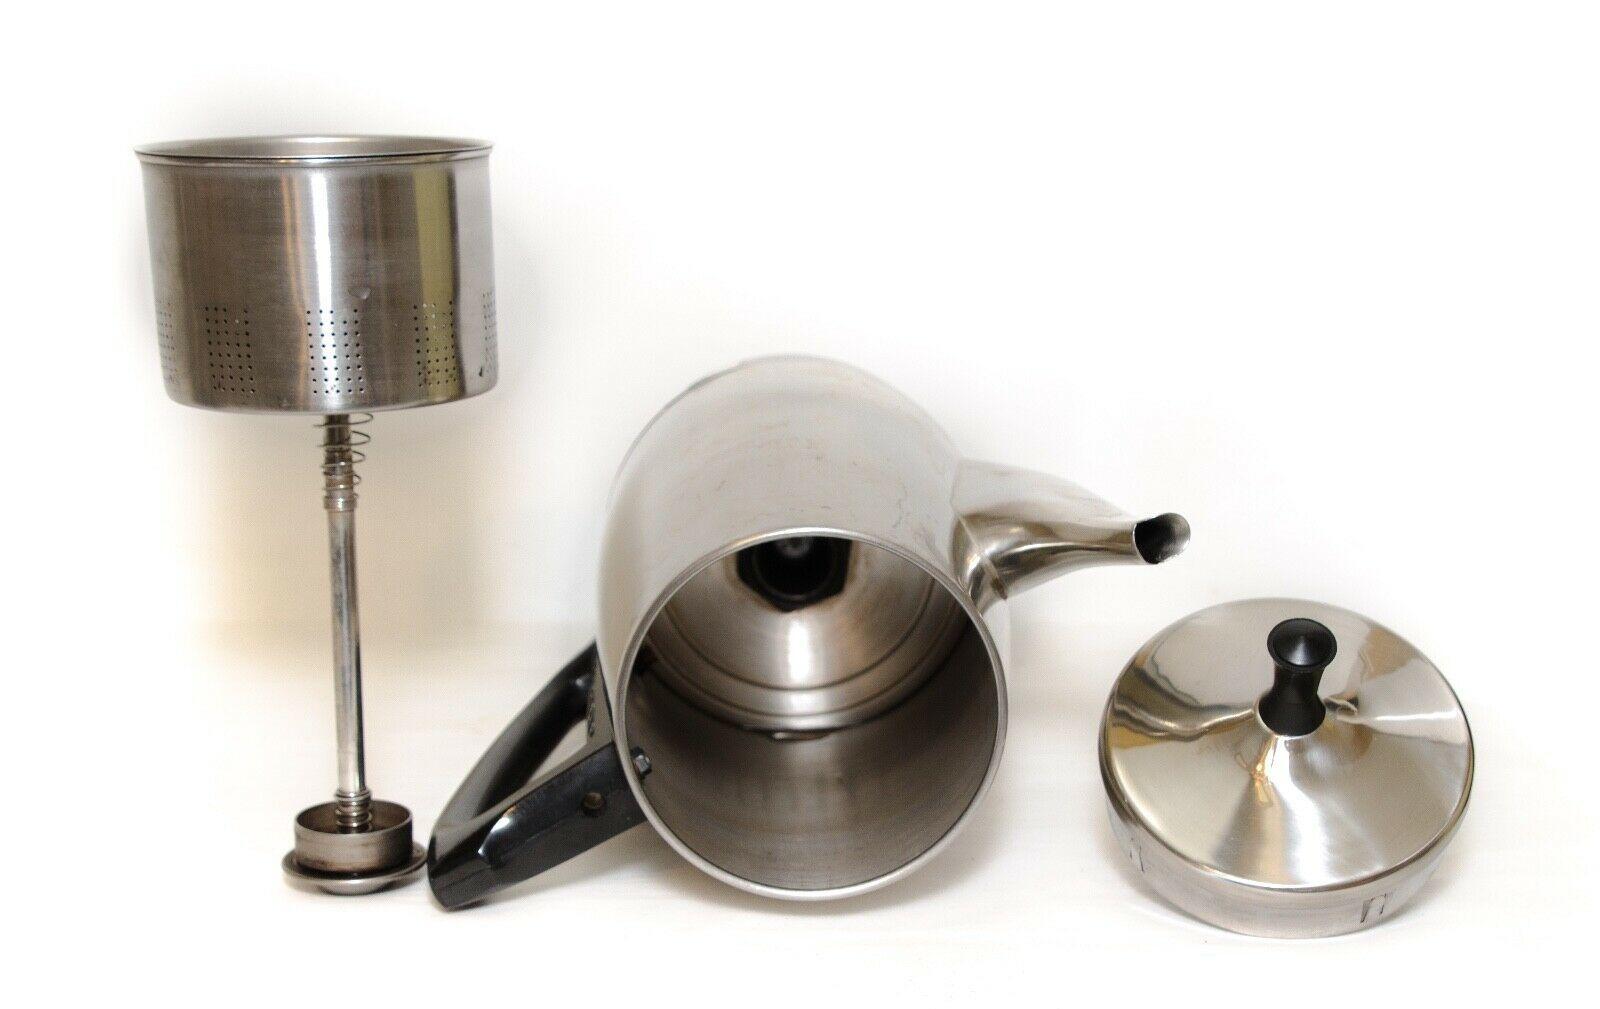 Vintage Charlescraft Coffee Percolator Stainless Steel 12-Cup Model AP-12